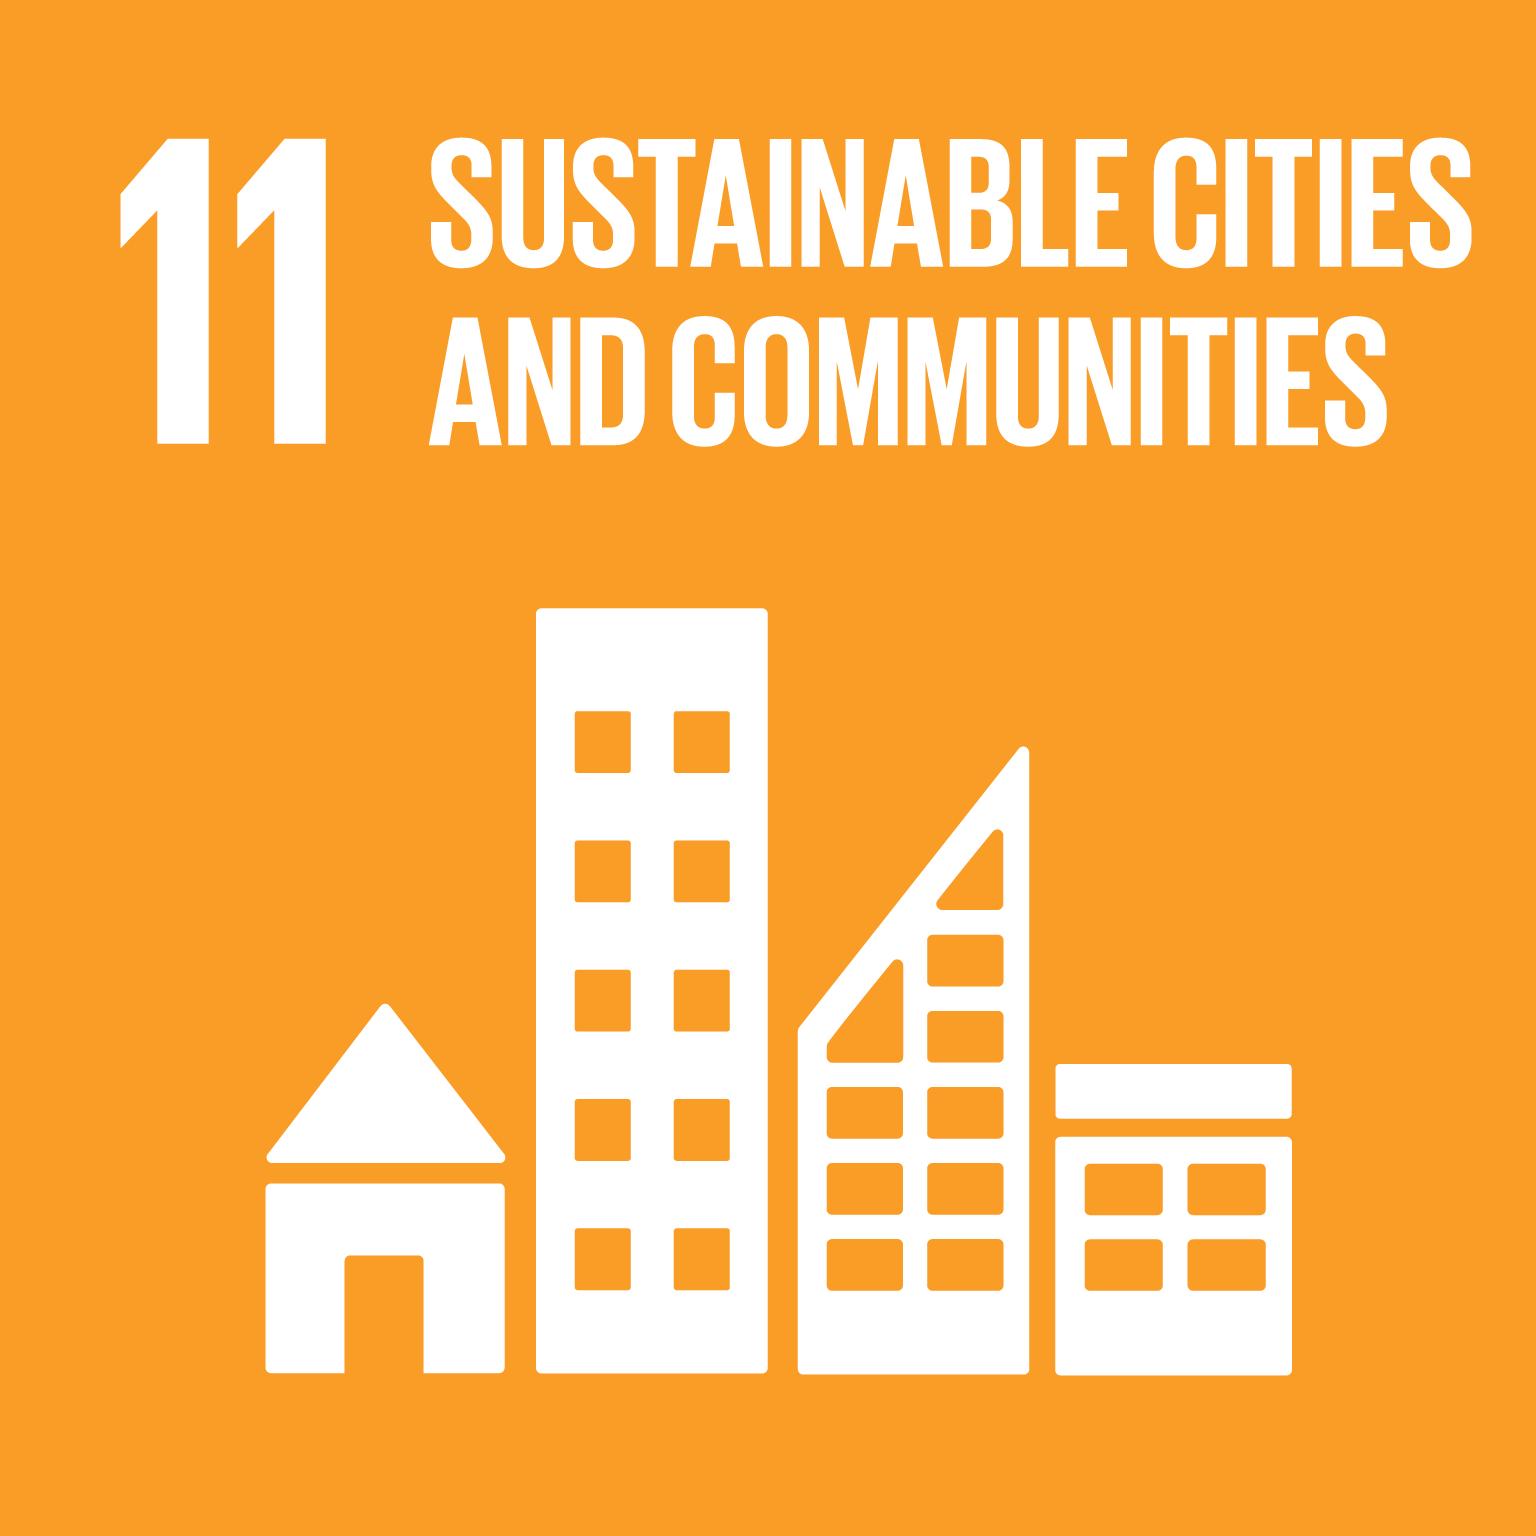 E_SDG goals_icons-individual-rgb-11.png